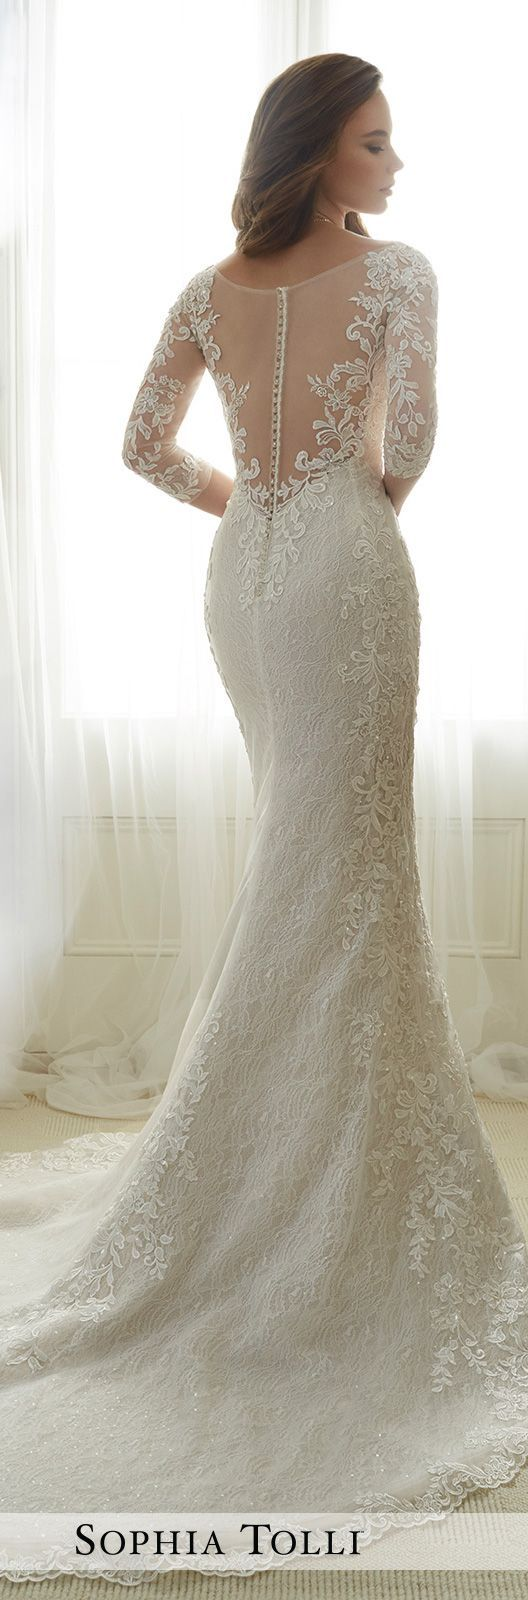 Wedding Dress by Sophia Tolli Spring 2017 Bridal Collection | Style No. » Y11702 Gabrielle